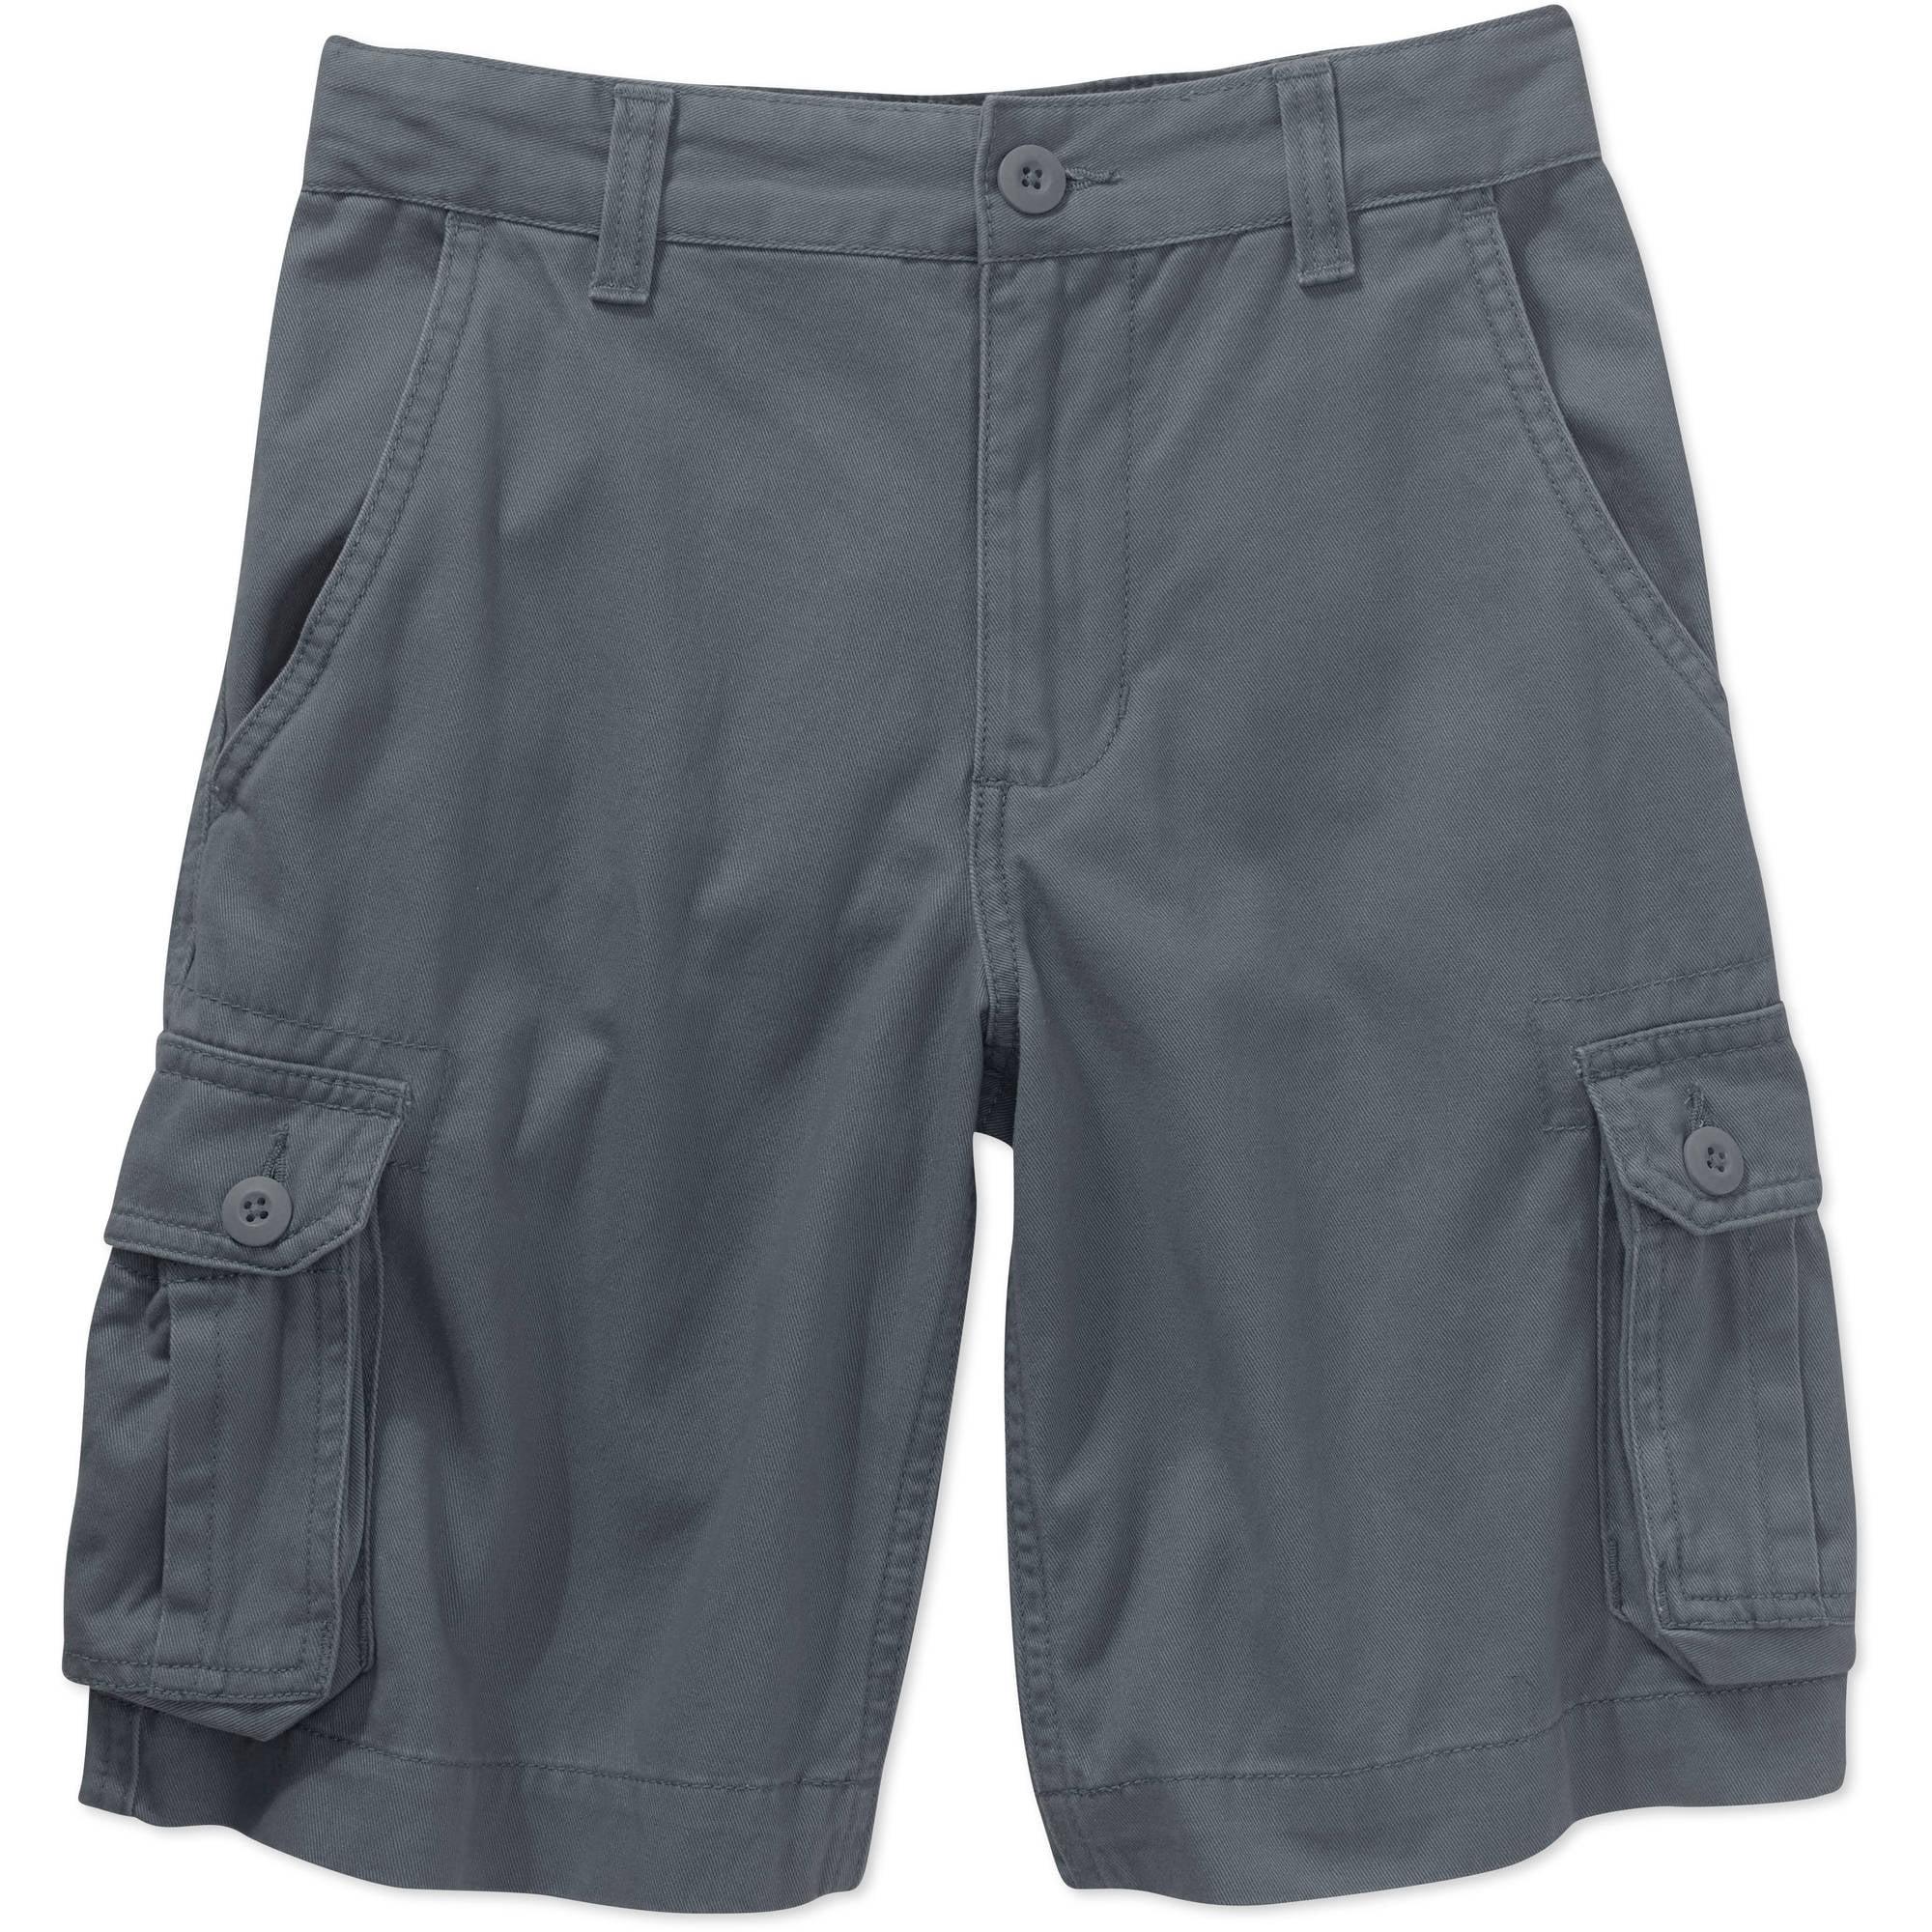 Faded Glory Boys Solid Cargo Shorts